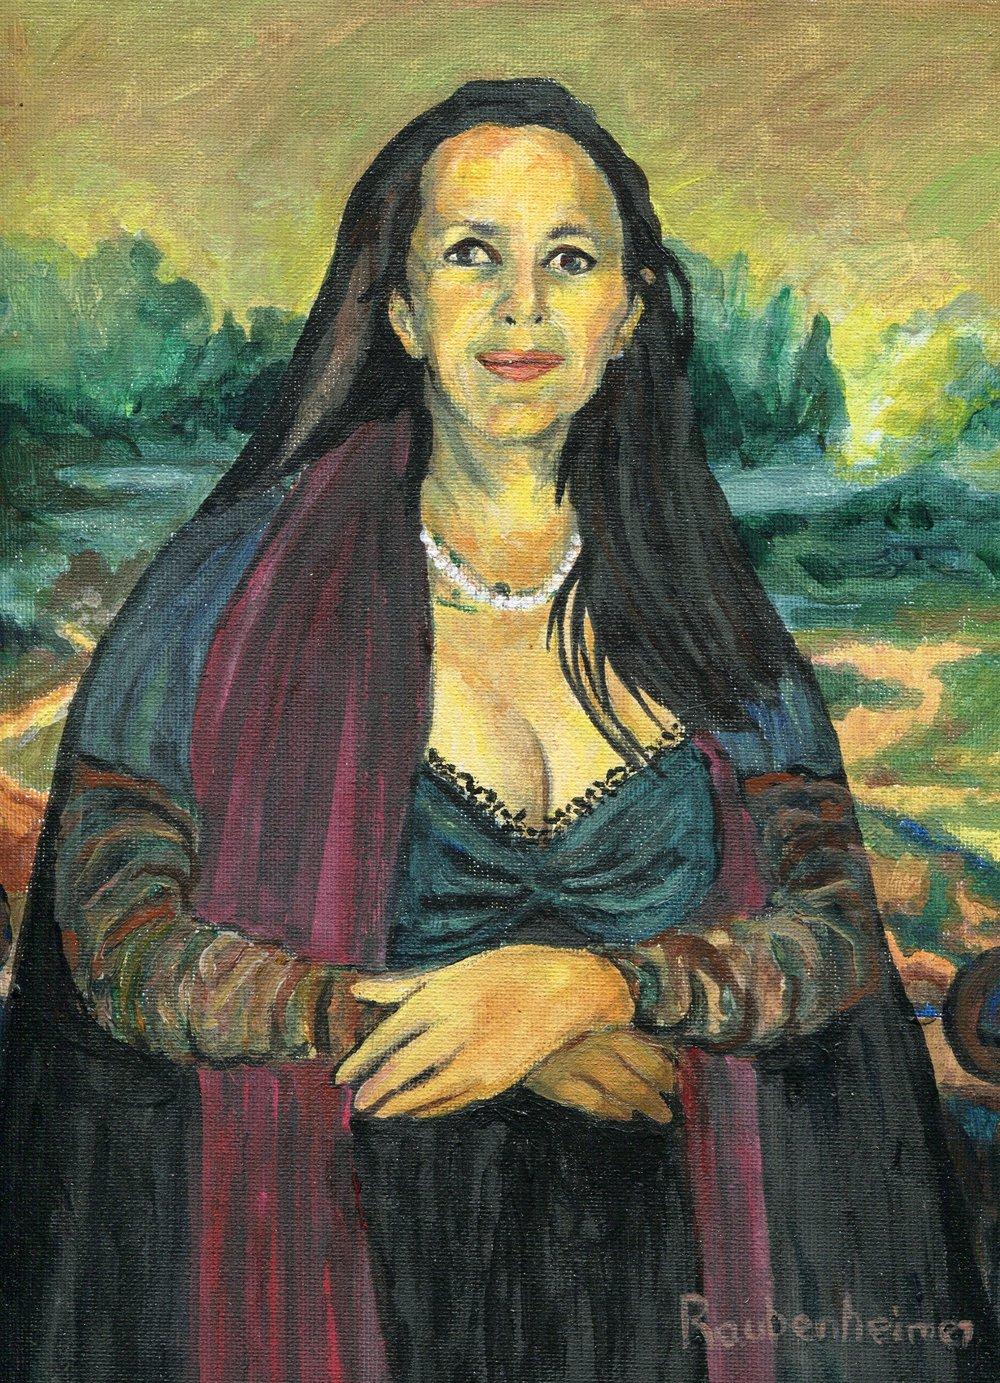 06a Nardi-Anne Raubenheimer, Thoroughly Modern Mona, Acrylic on canvas